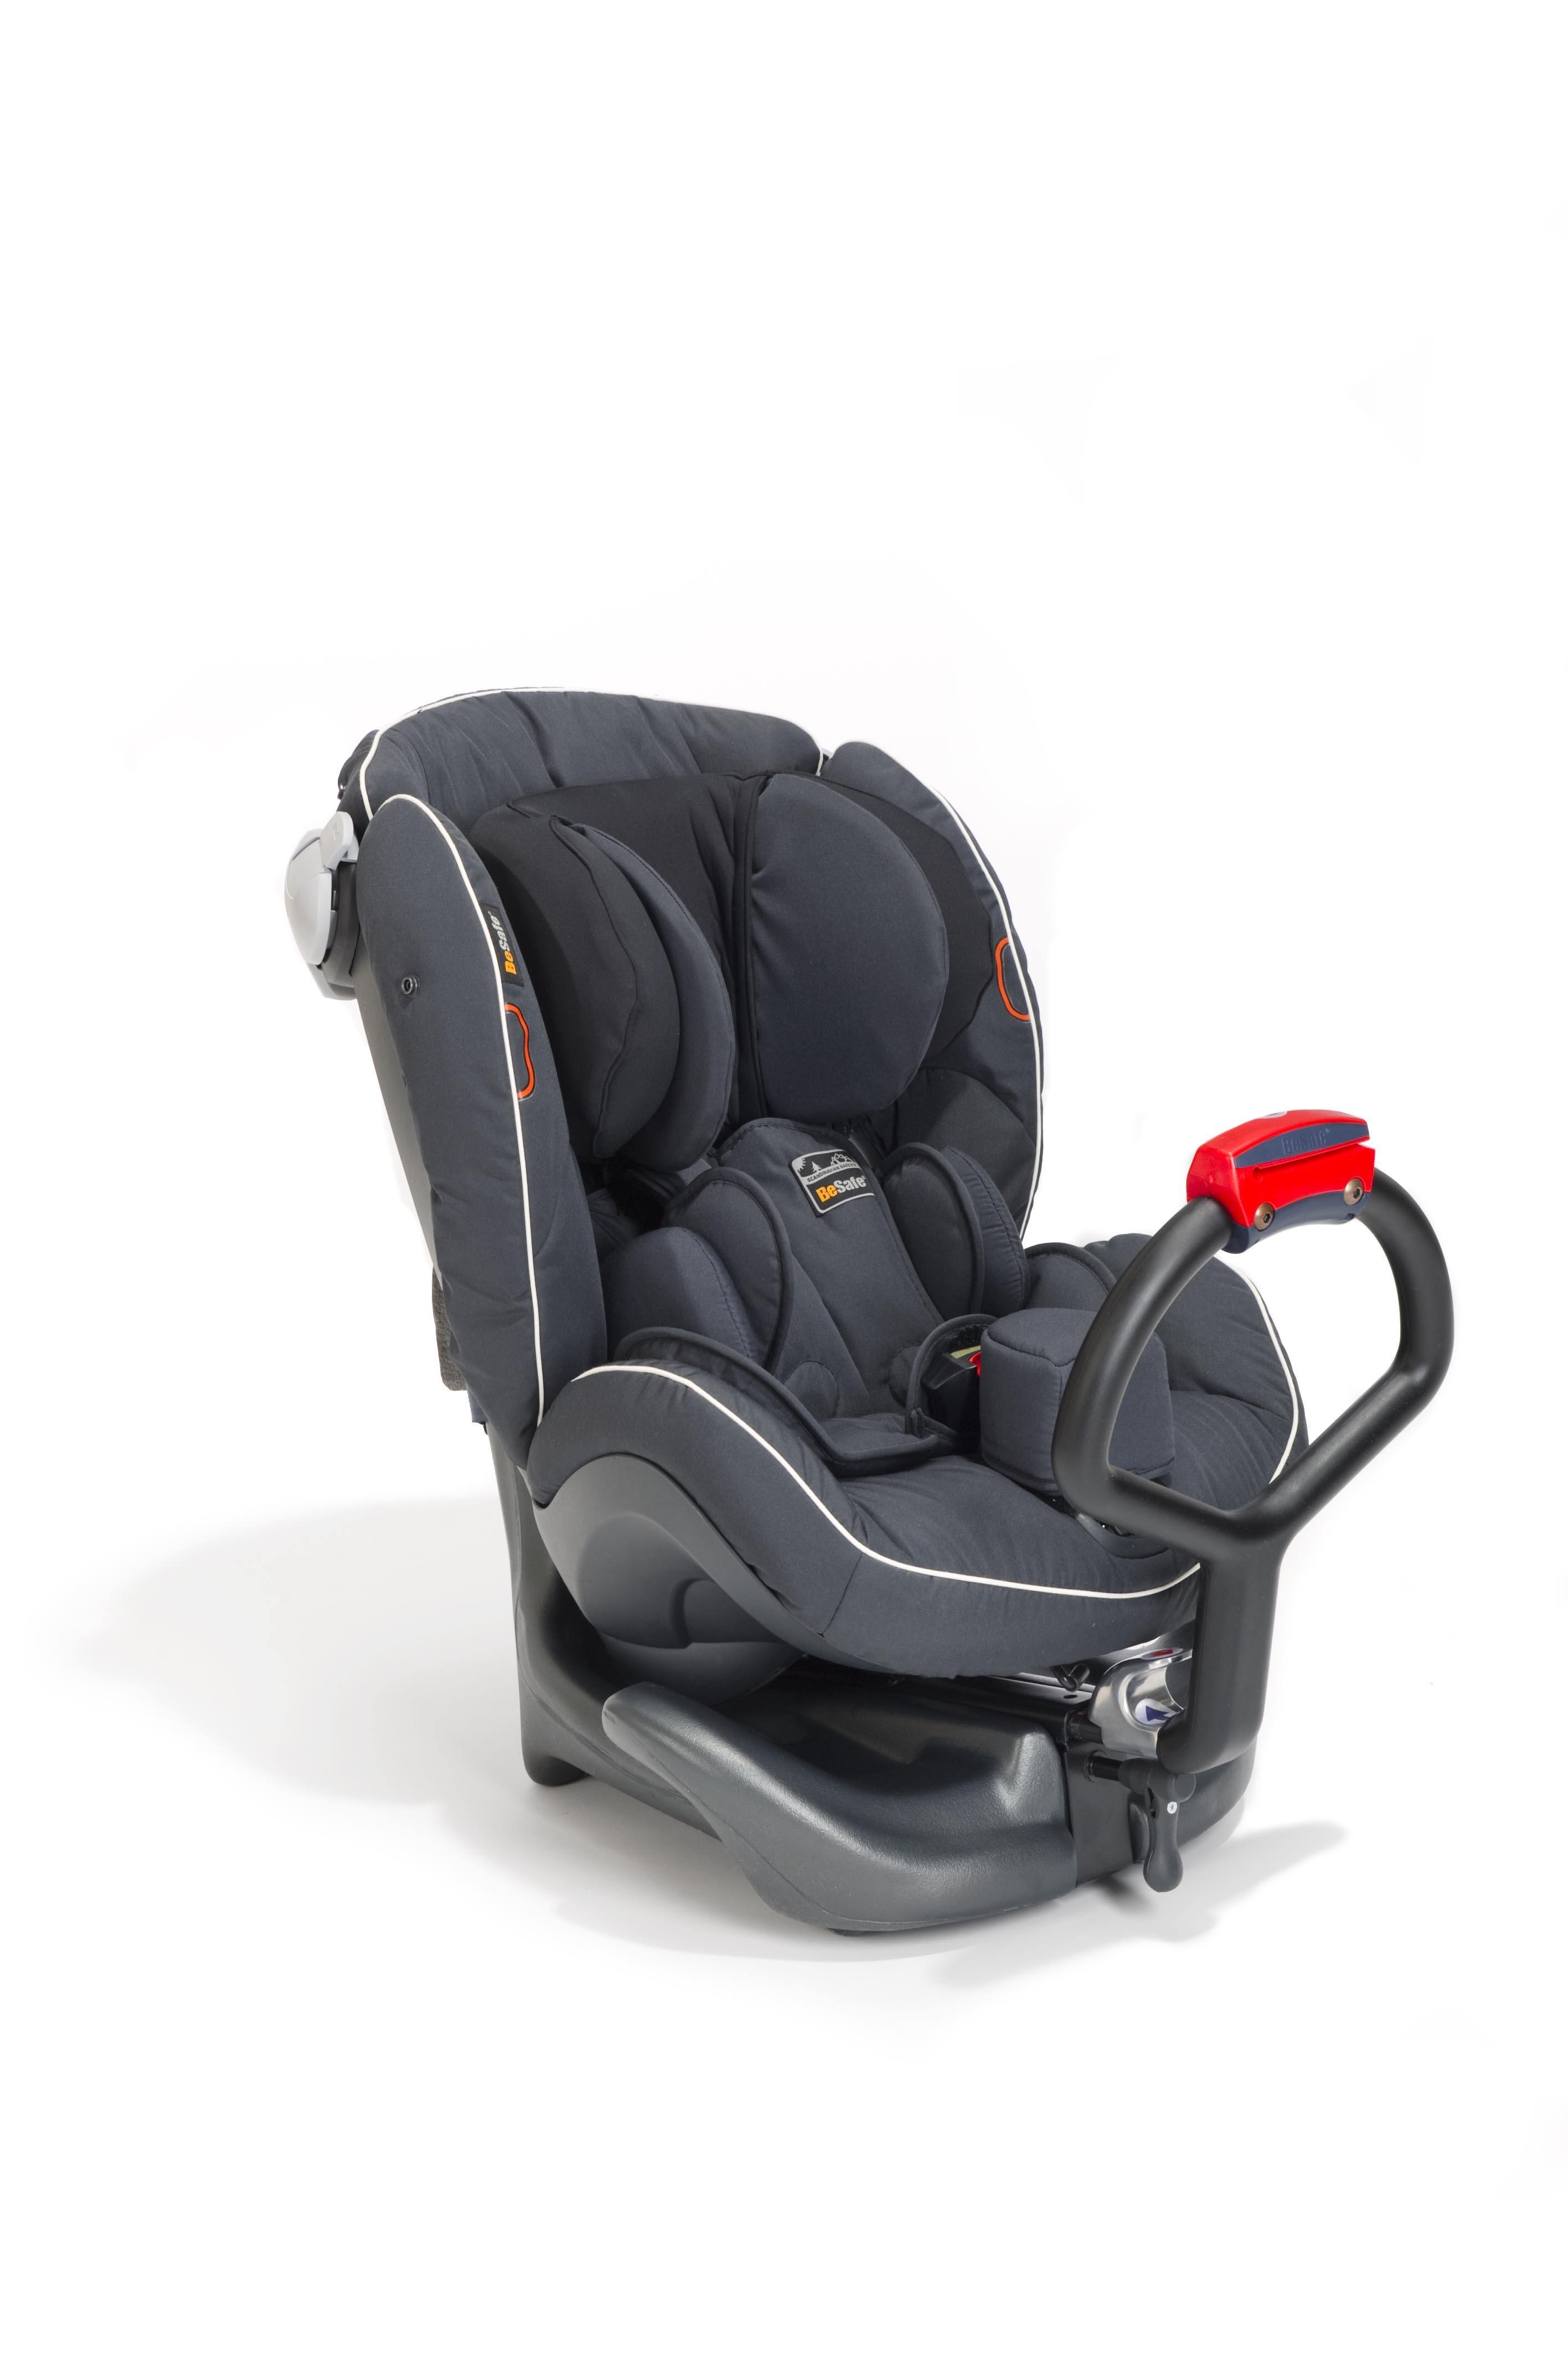 kinder-rehatechnik-ergonomic6